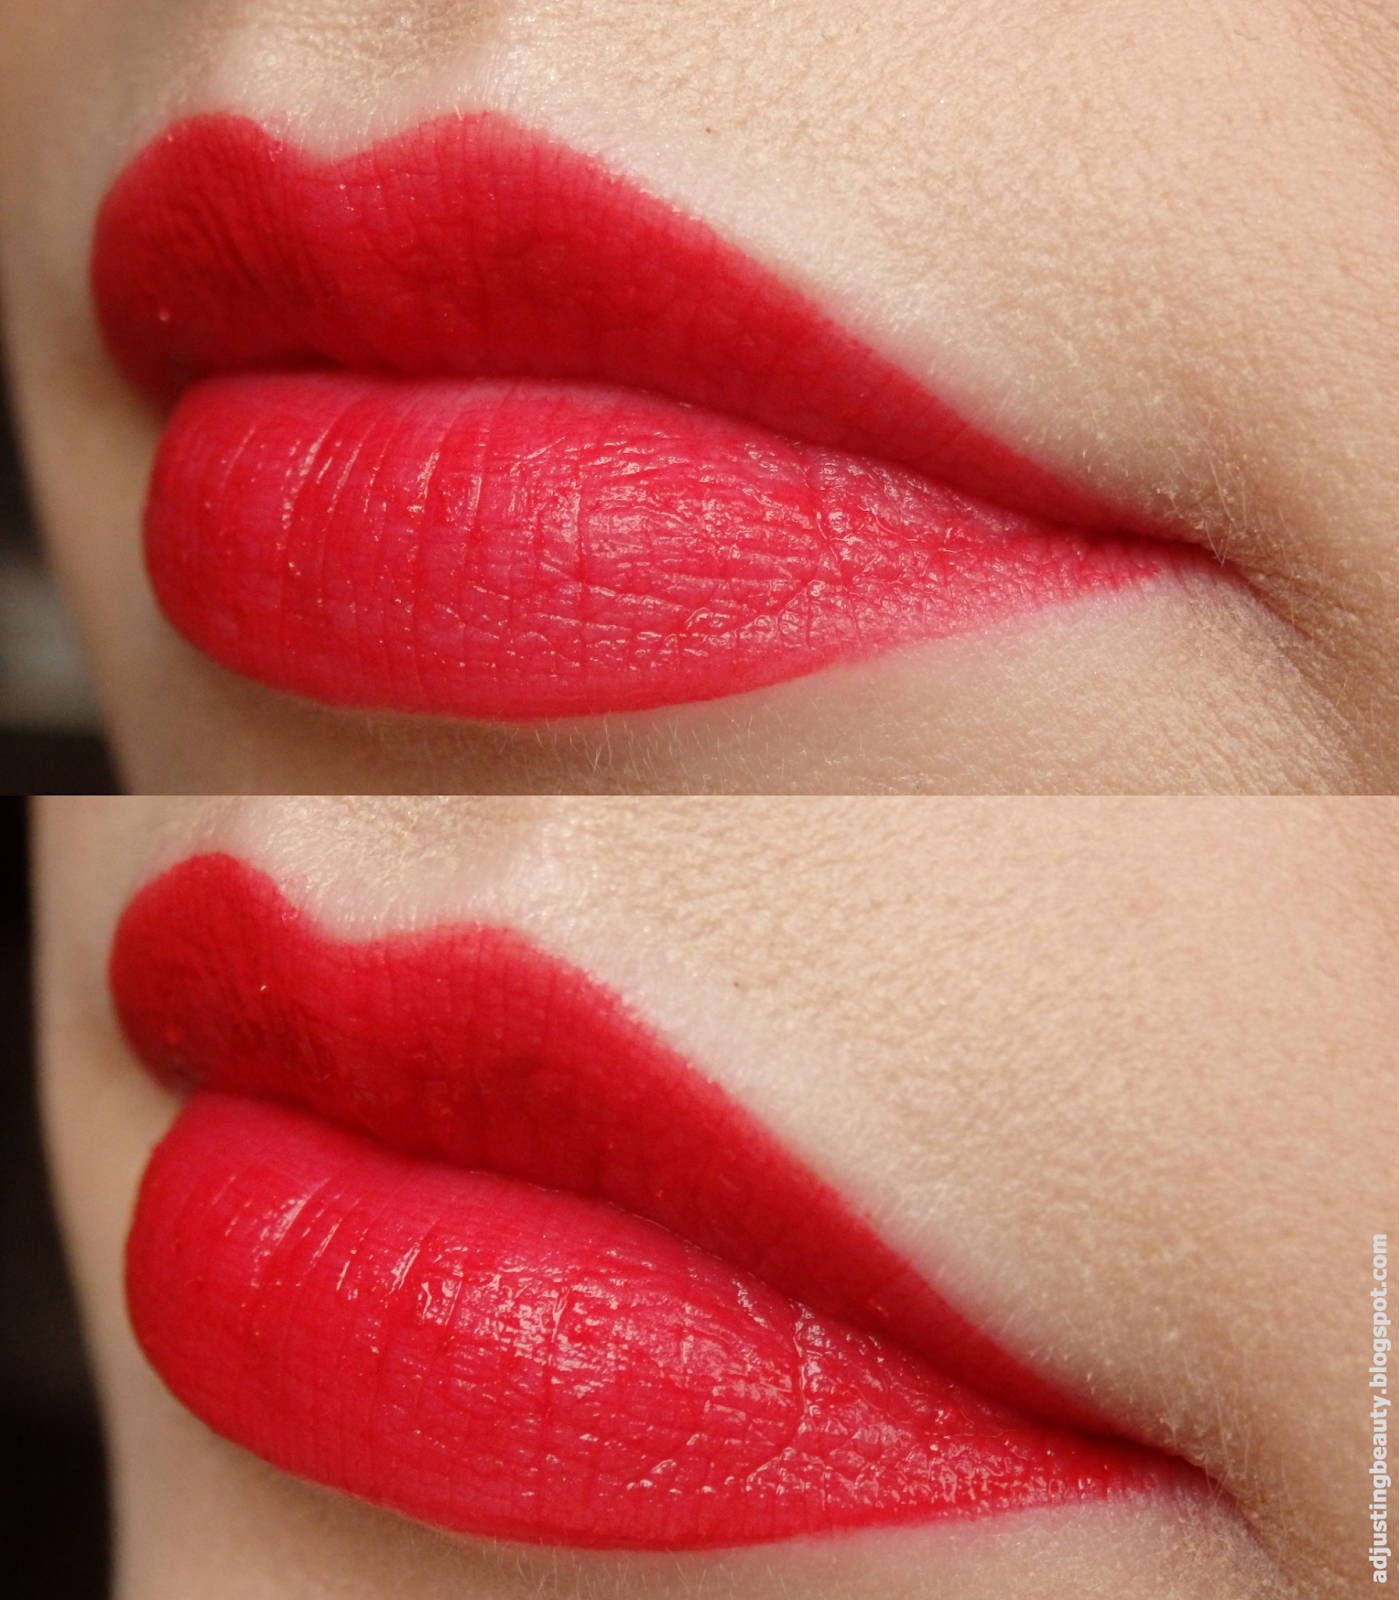 Son Bourjois Rouge Edition Velvet  01 - personne ne rouge swatch